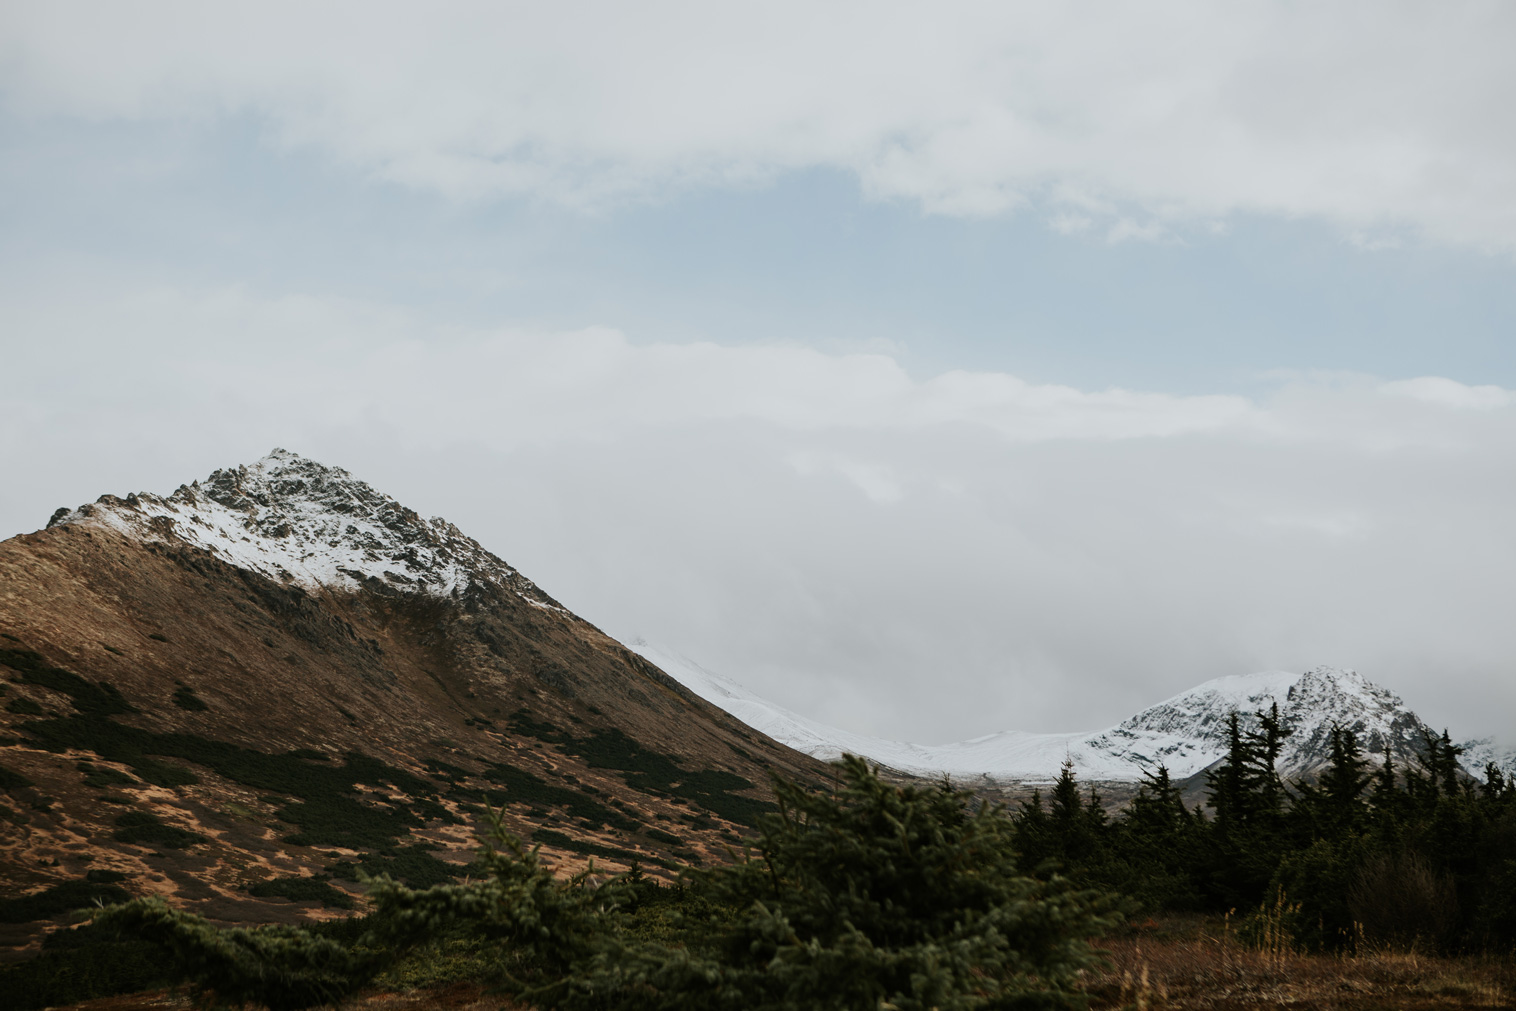 CindyGiovagnoli_Anchorage_Alaska_Flattop_mountain_hike_snocapped-002.jpg